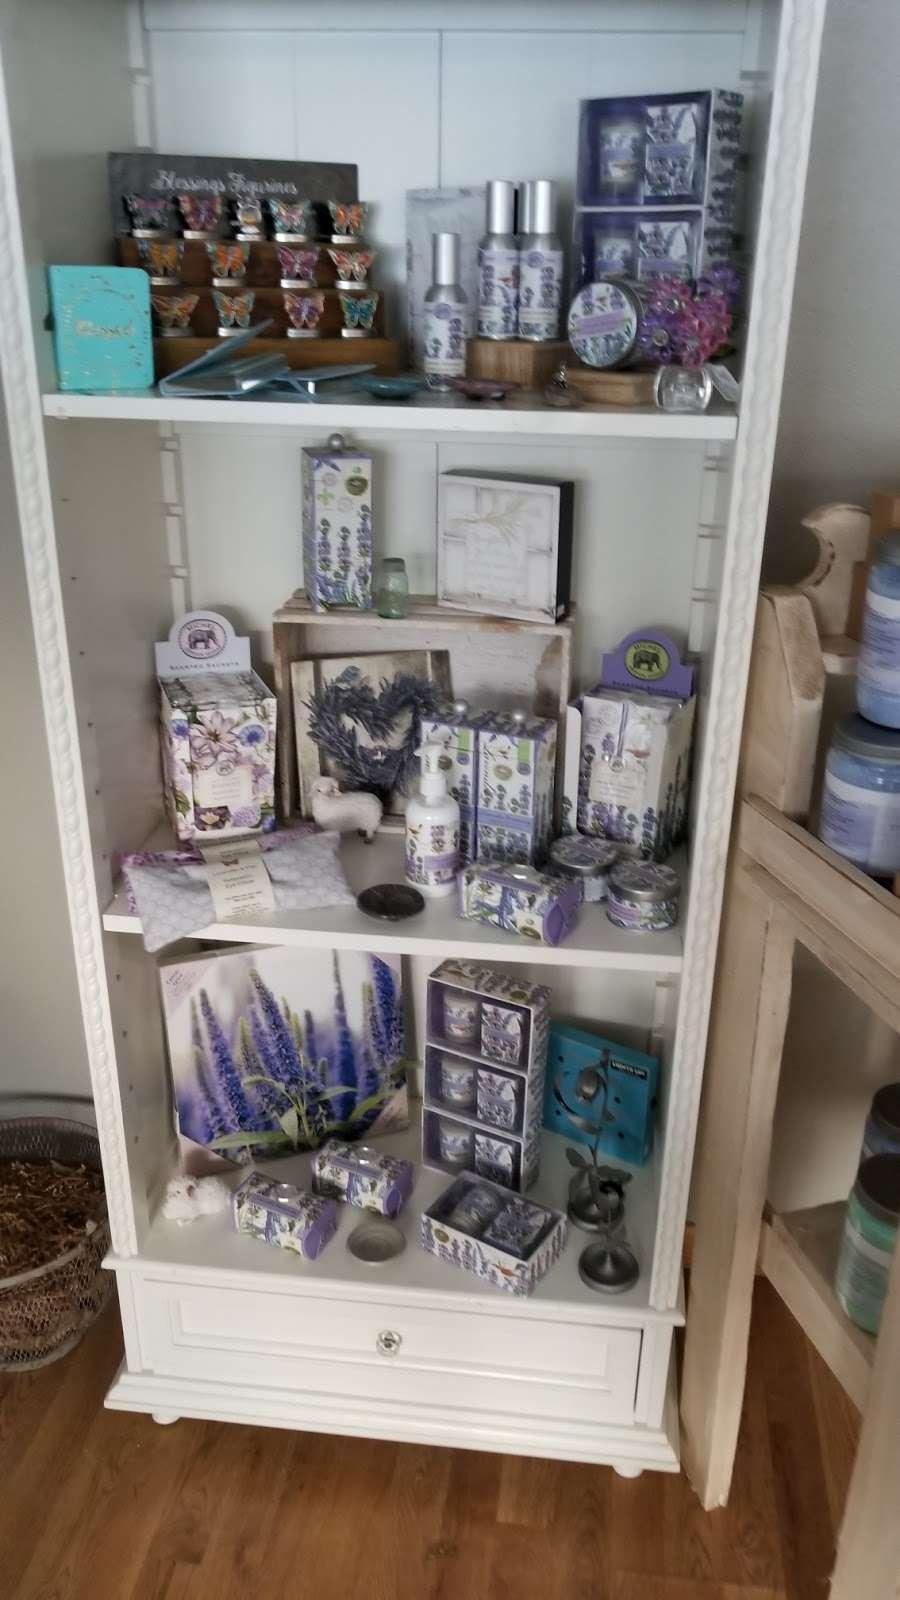 Krickettes Gift Shop - store    Photo 3 of 8   Address: 640 E Ryan Rd, Oak Creek, WI 53154, USA   Phone: (414) 775-2017